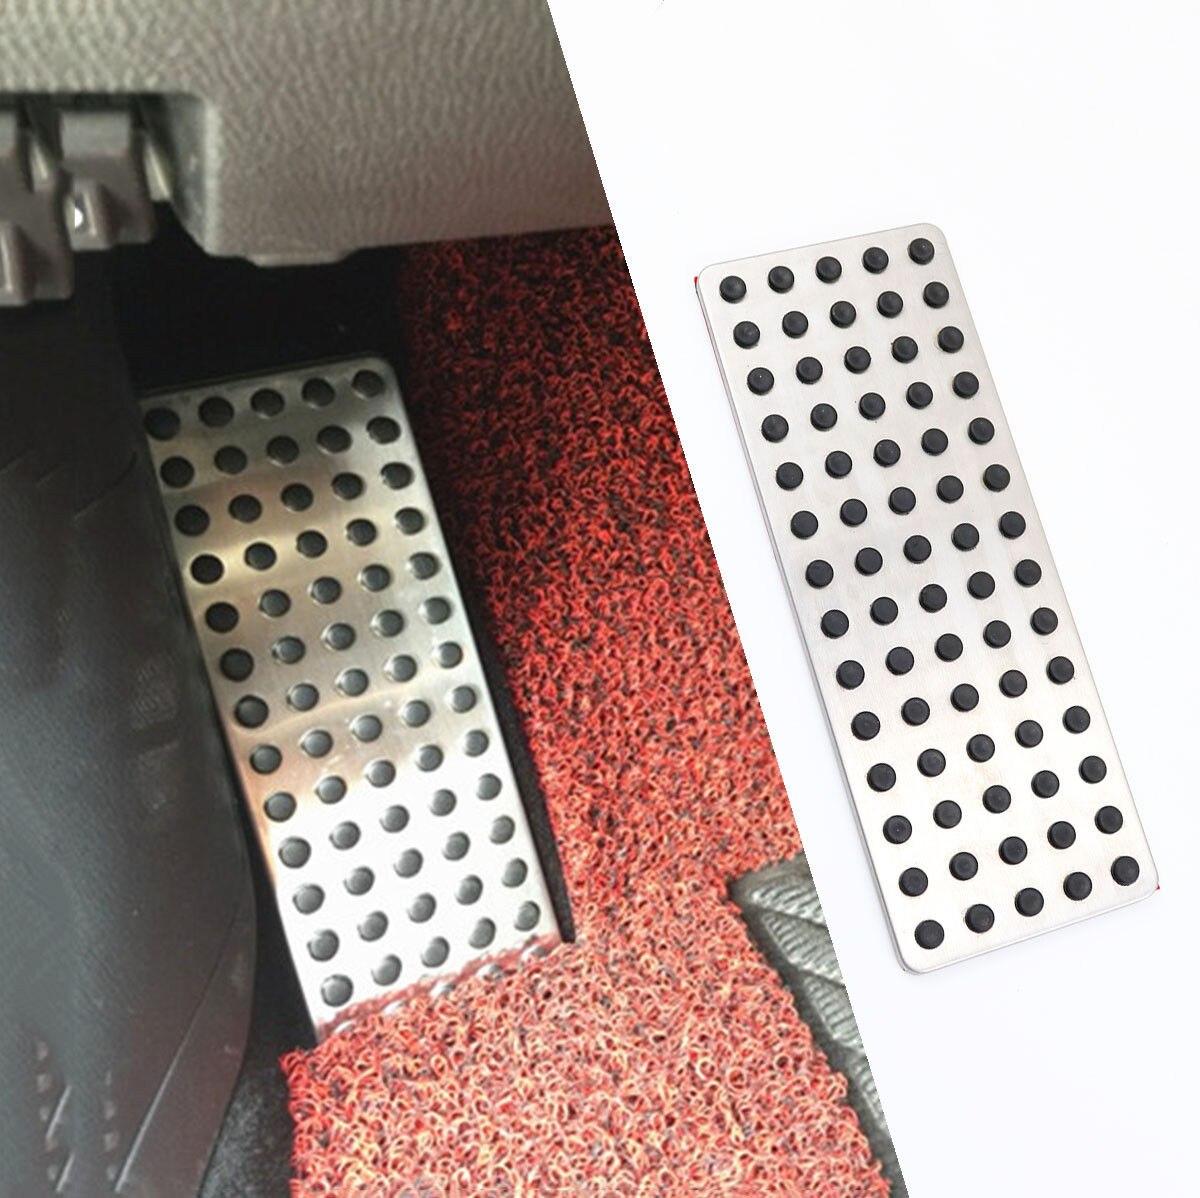 CHROME  SILVER  SIMULATED ALUMINUM FLOOR MATS 4 PCS  AAA+